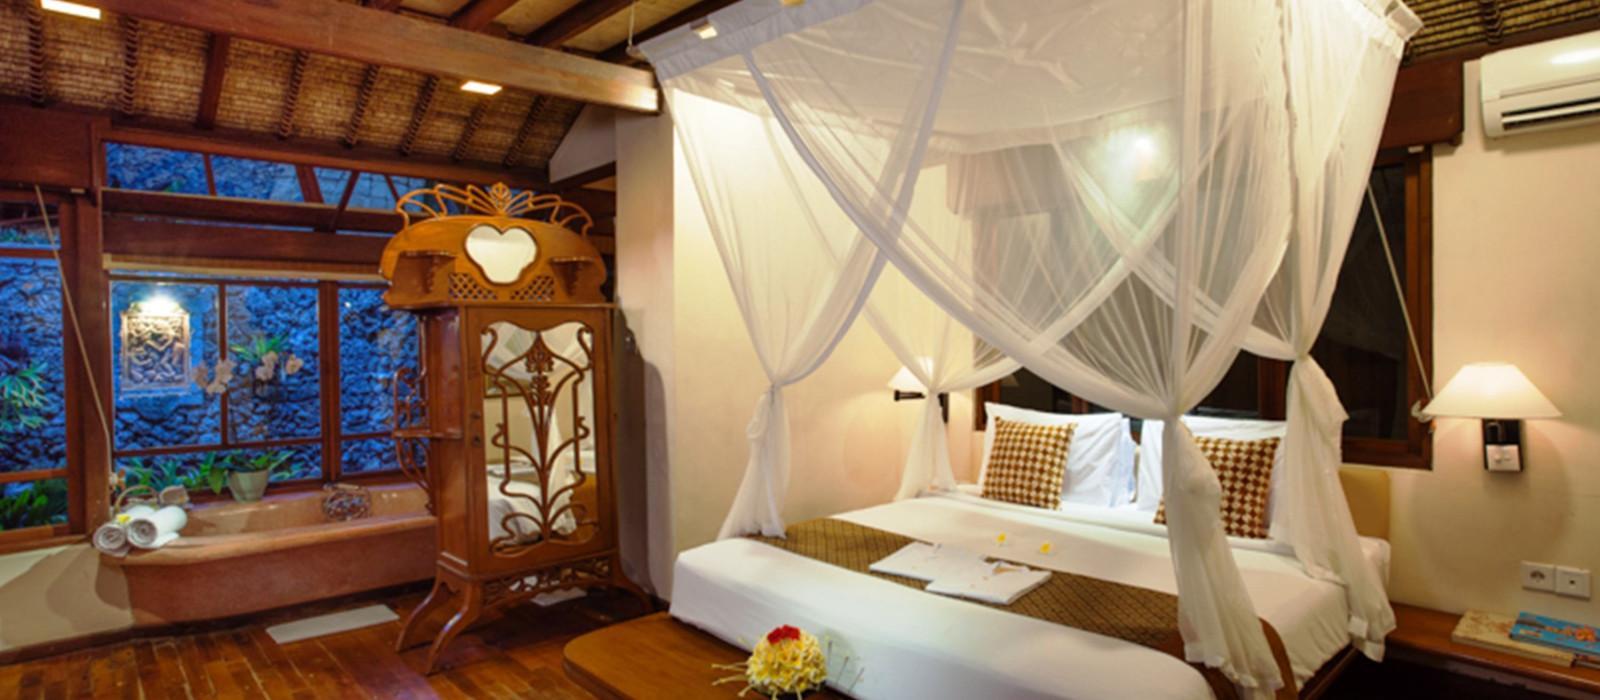 Hotel The Tandjung Sari Indonesien